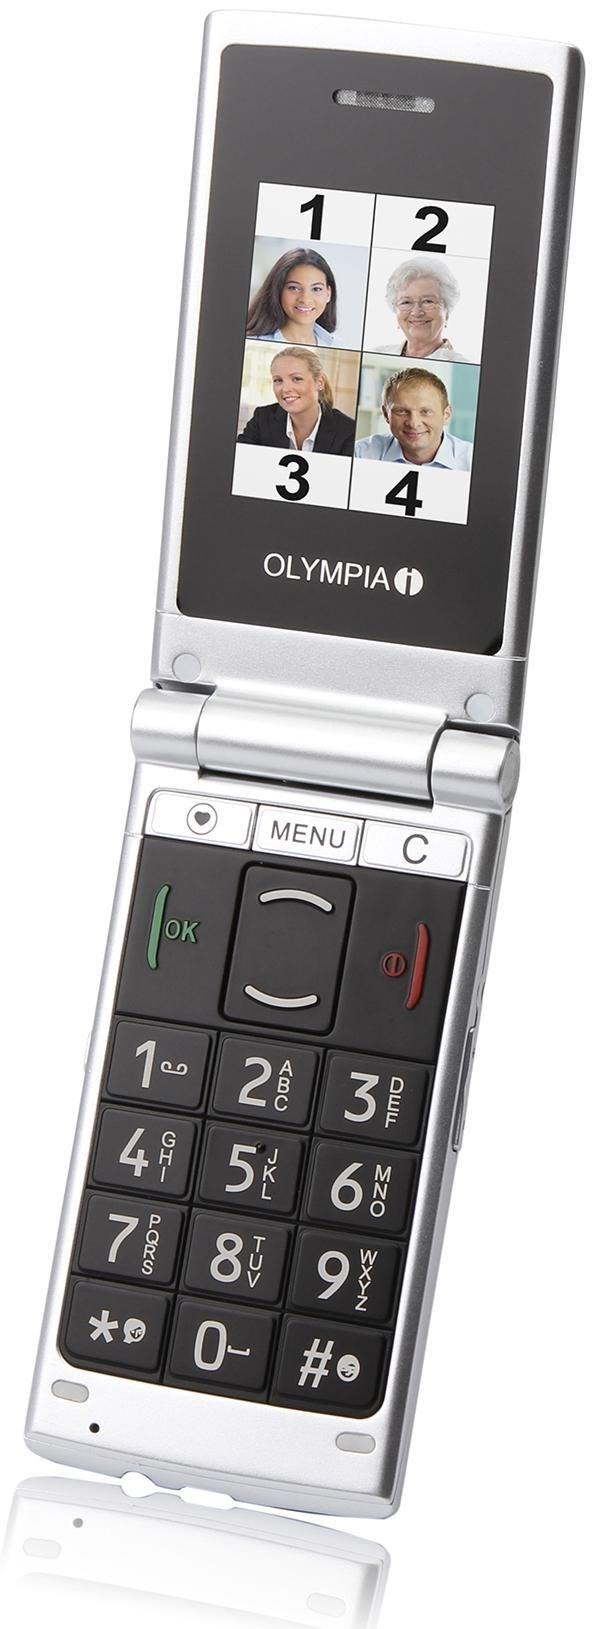 Olympia Nova Plus 2149  32 MB Klapp Handy ohne Vertrag/SIMlock,  schwarz (Handy)